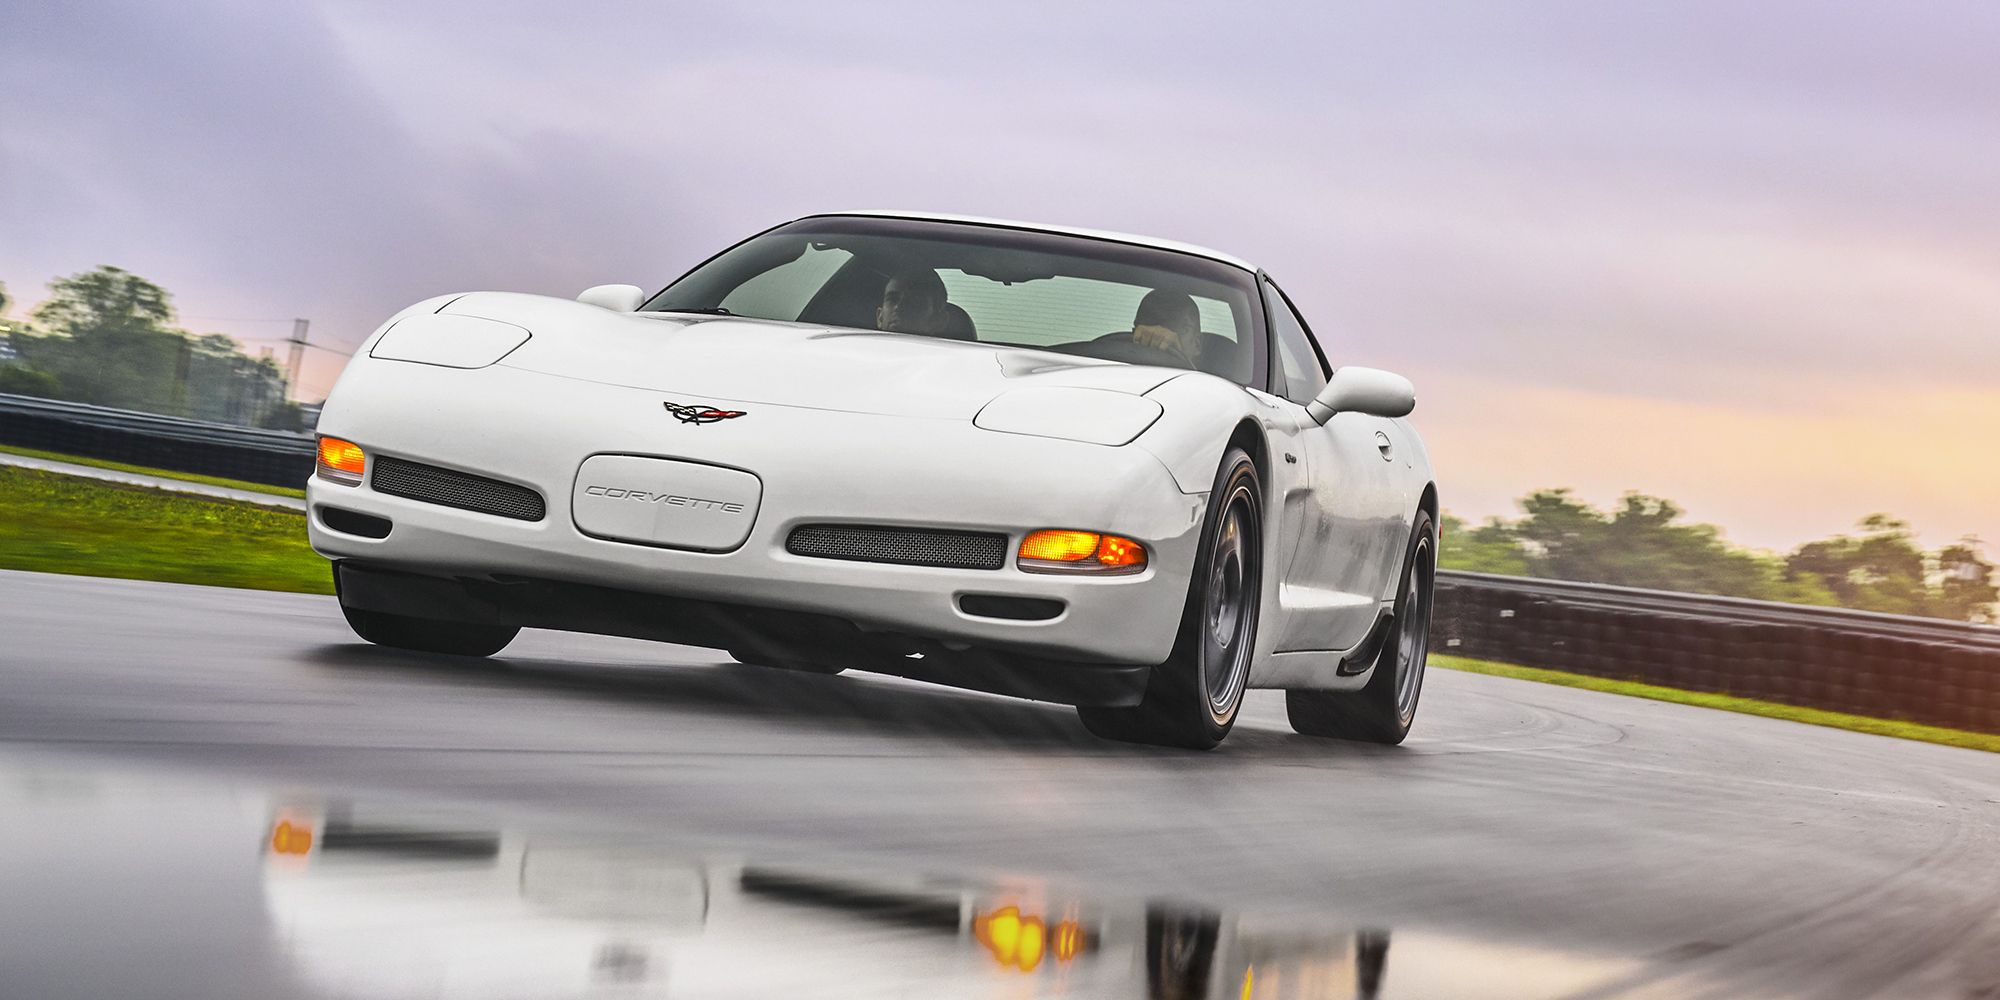 the c5 corvette may